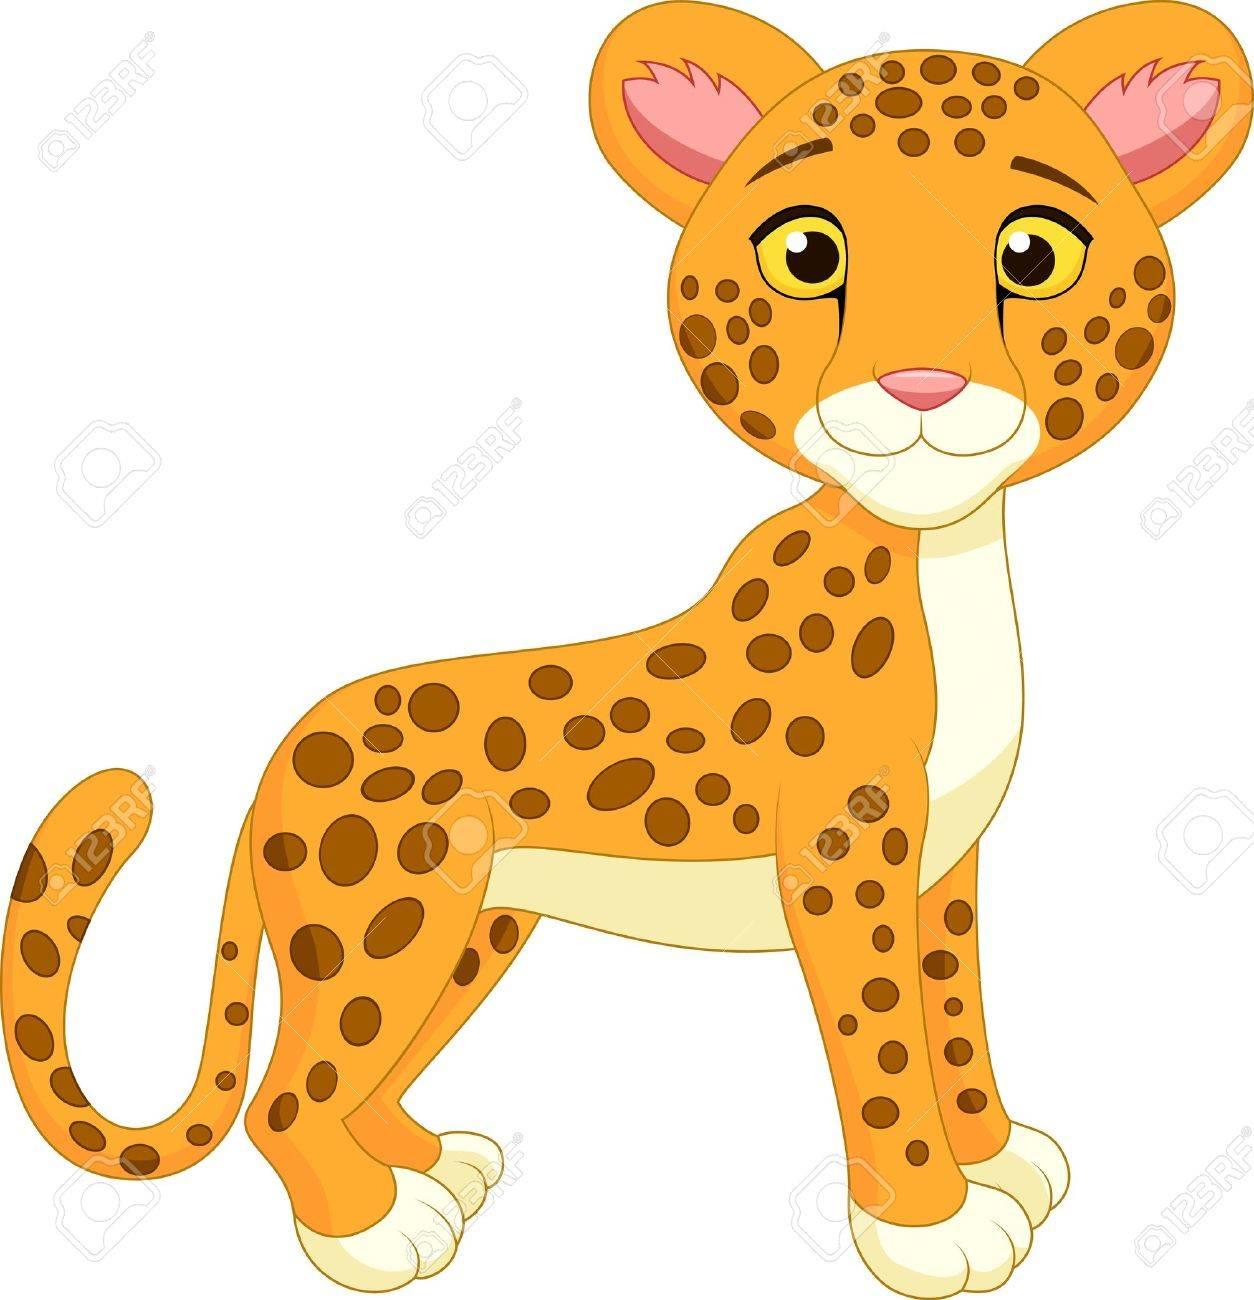 Cute cheetah cartoon.